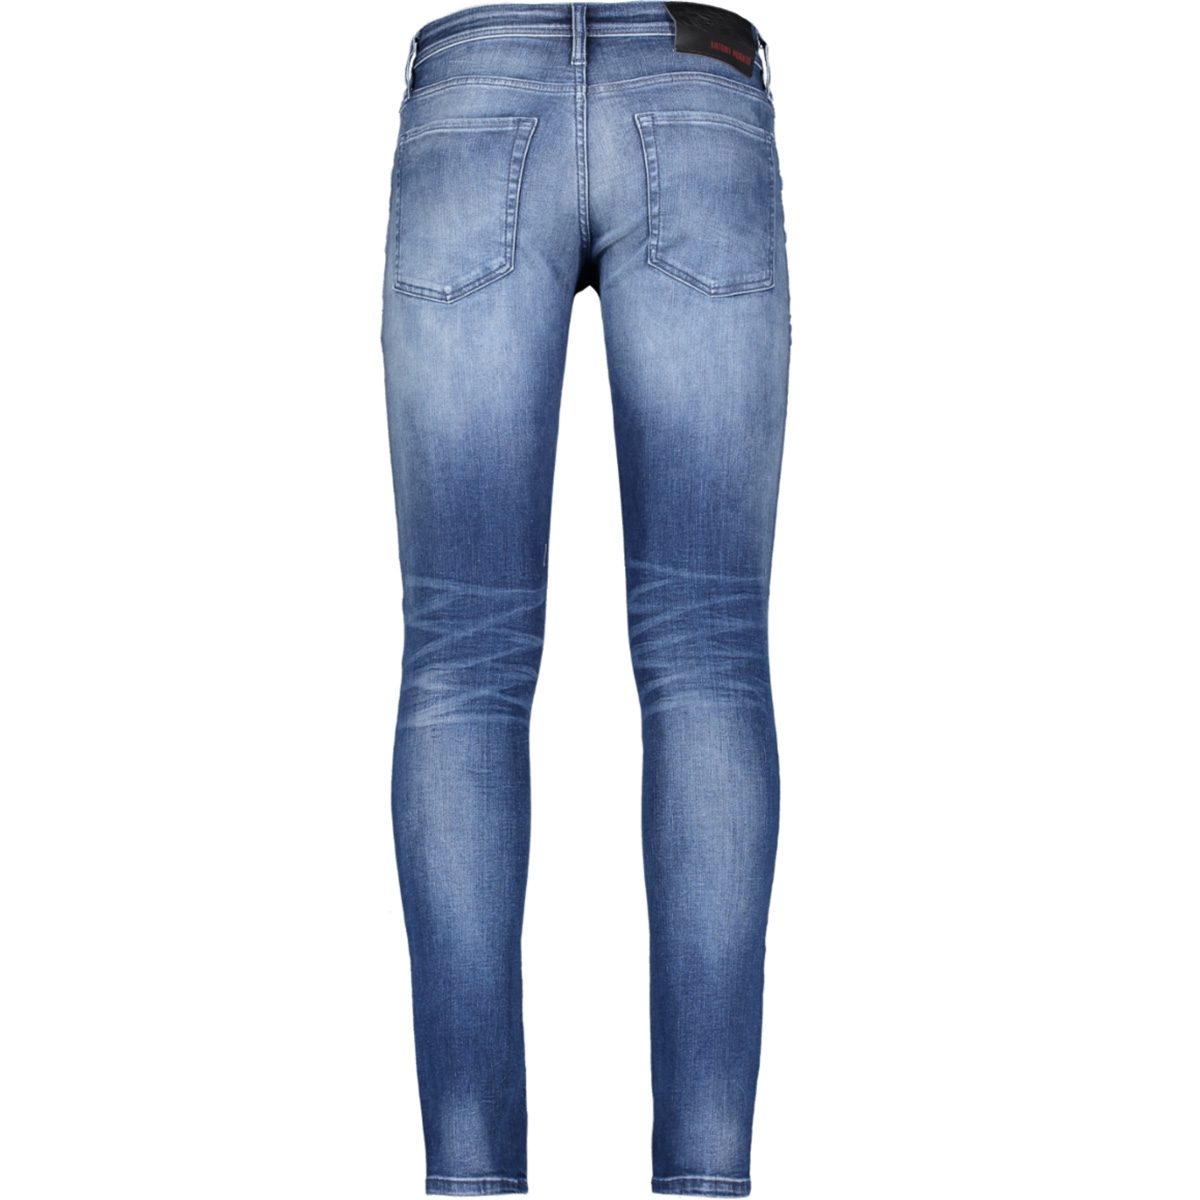 jeans tapered ozzy mmdt00241 antony morato jeans 7010 blue denim